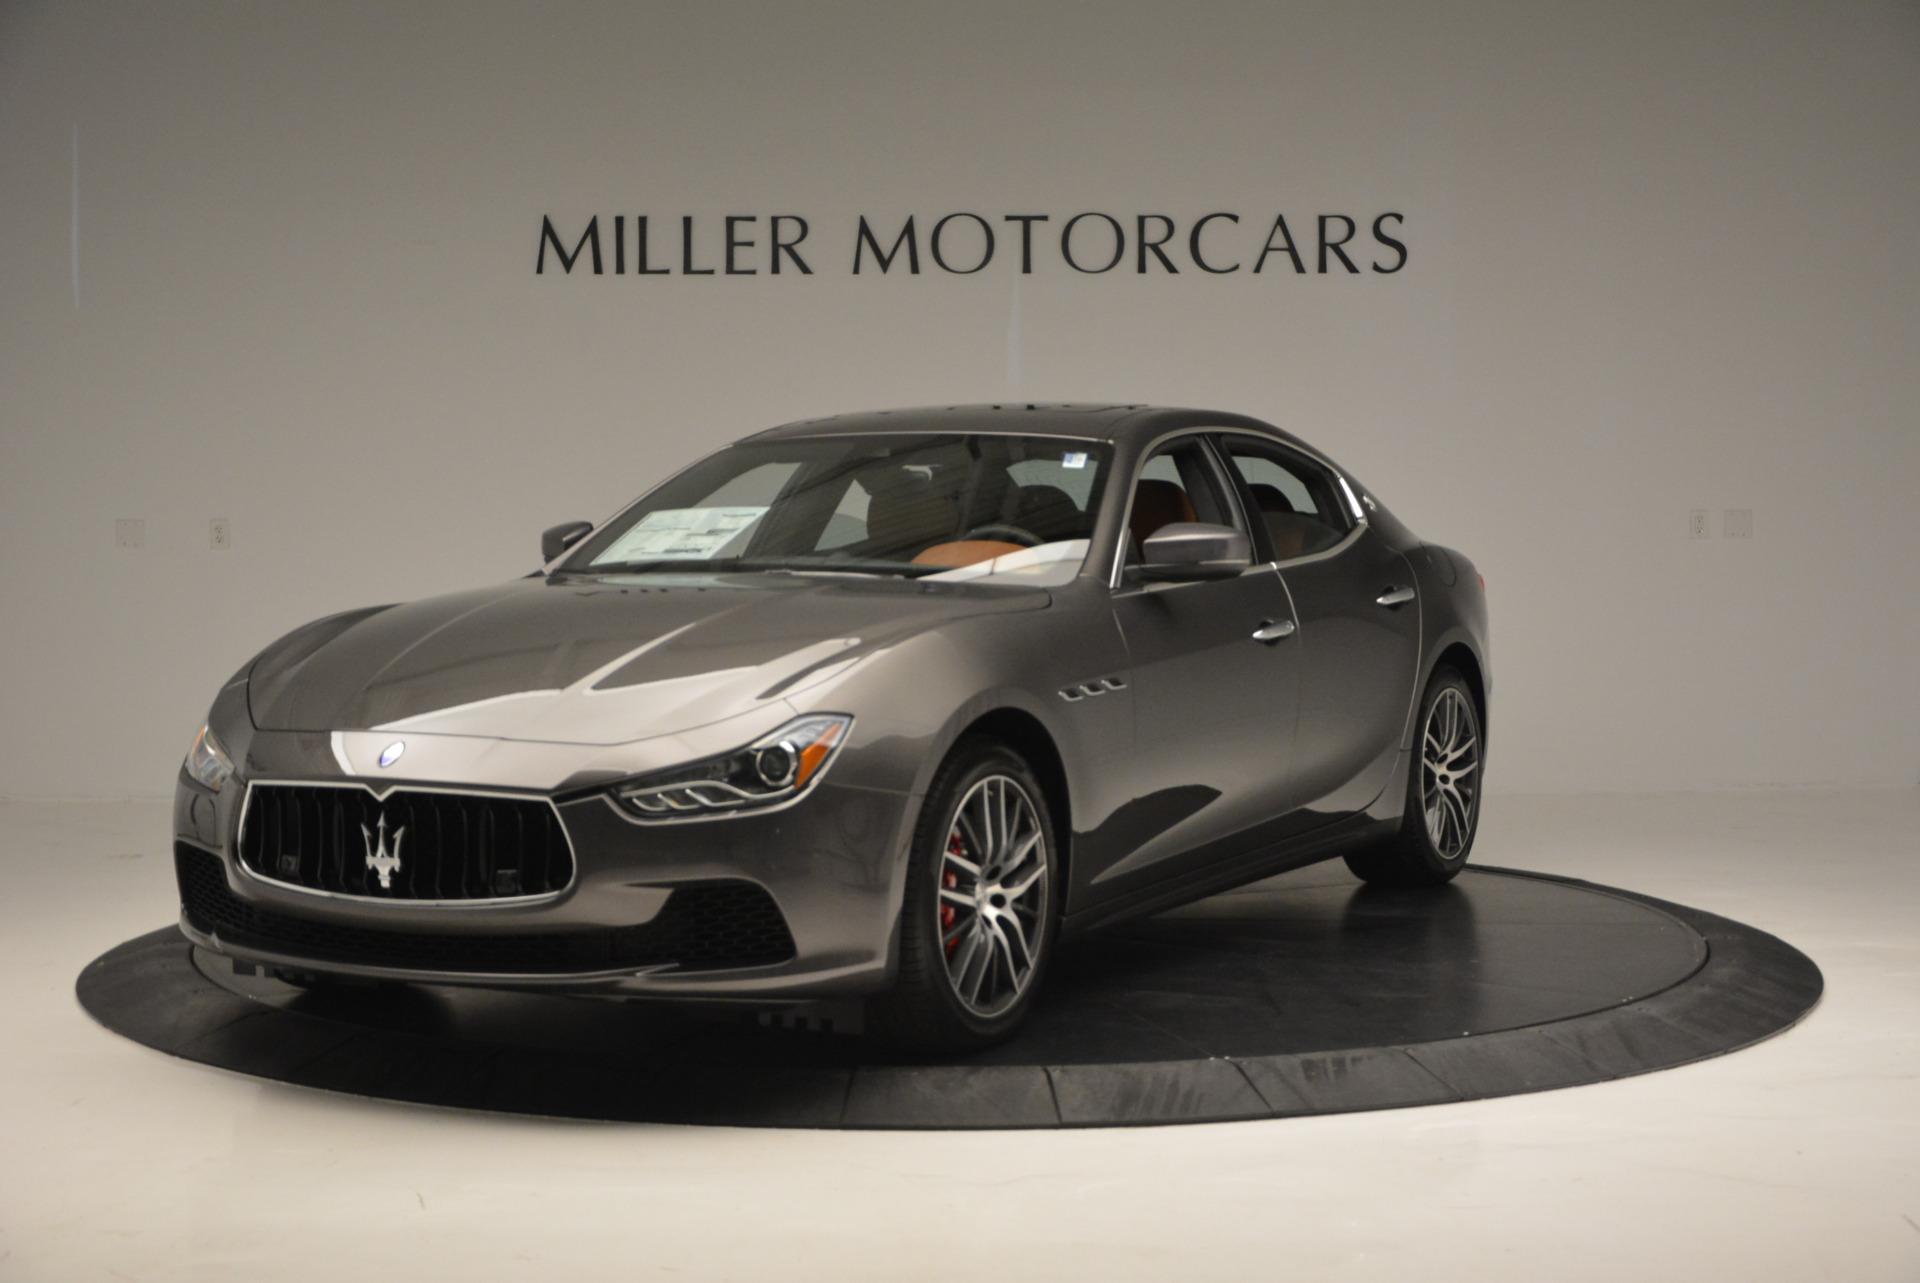 Used 2017 Maserati Ghibli S Q4  EX-LOANER For Sale In Greenwich, CT. Alfa Romeo of Greenwich, W311 565_main